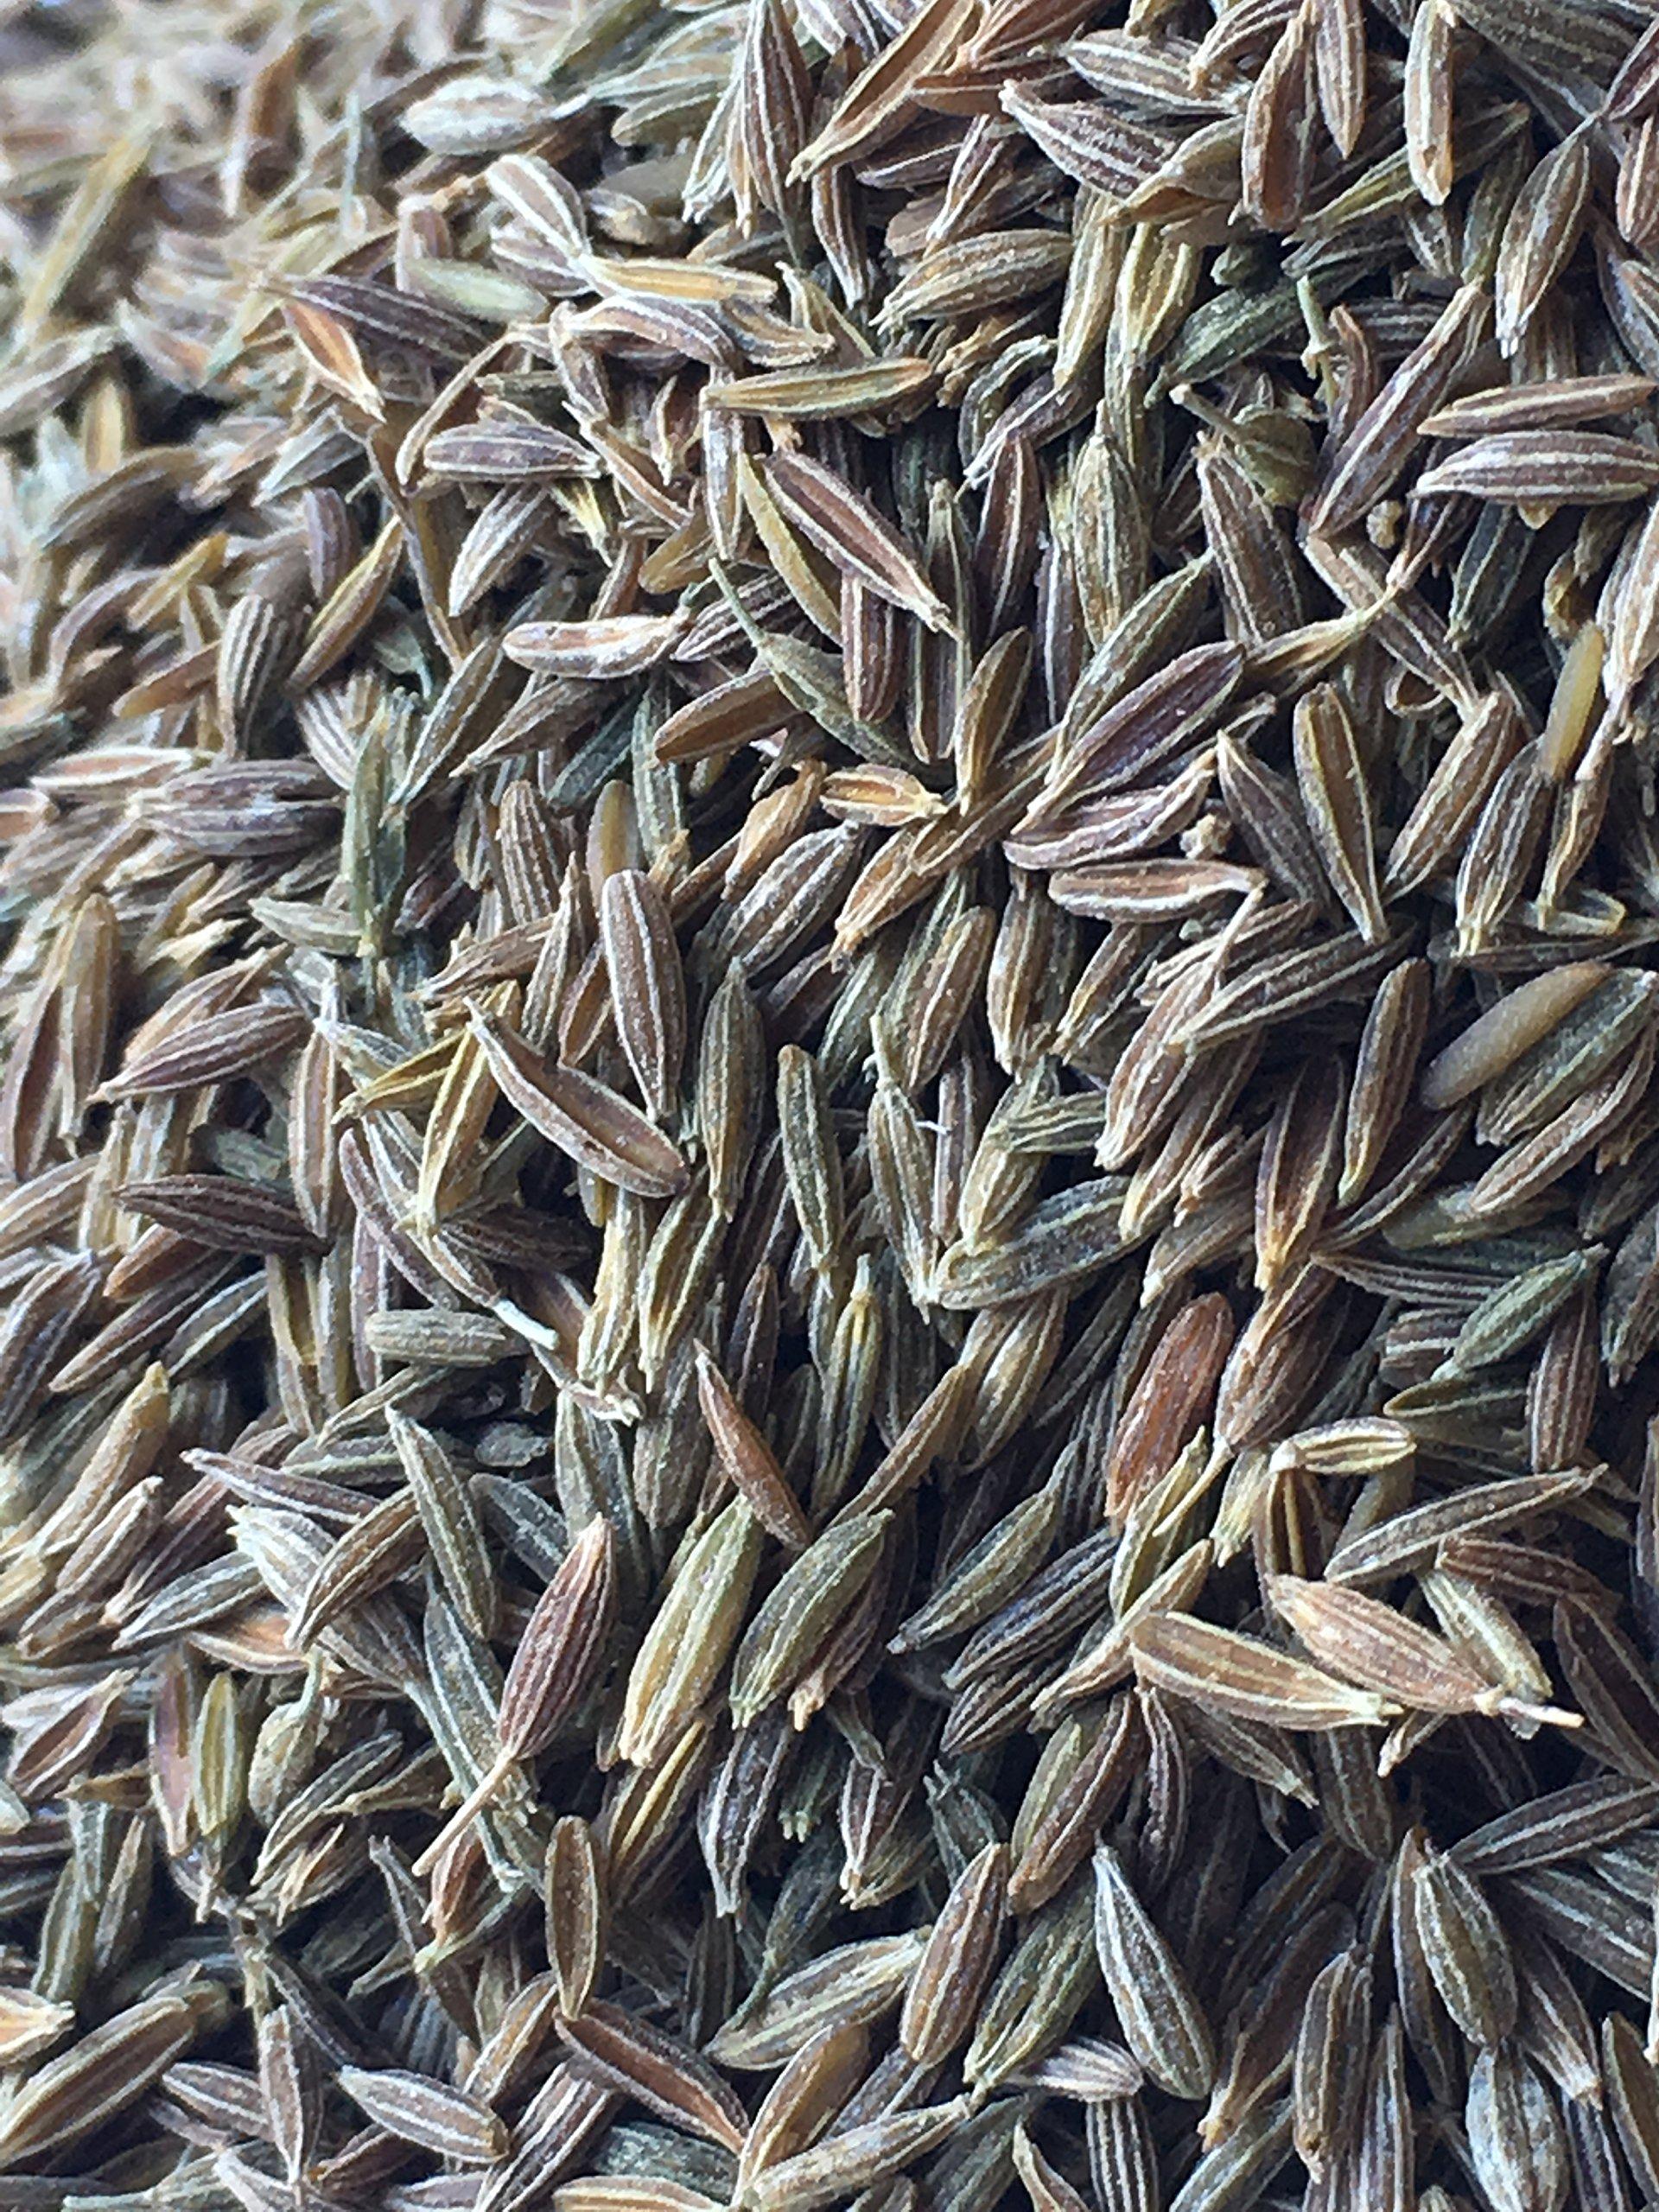 Cumin, 100% Natural Green Persian Cumin. Premium quality (105 Ounce)